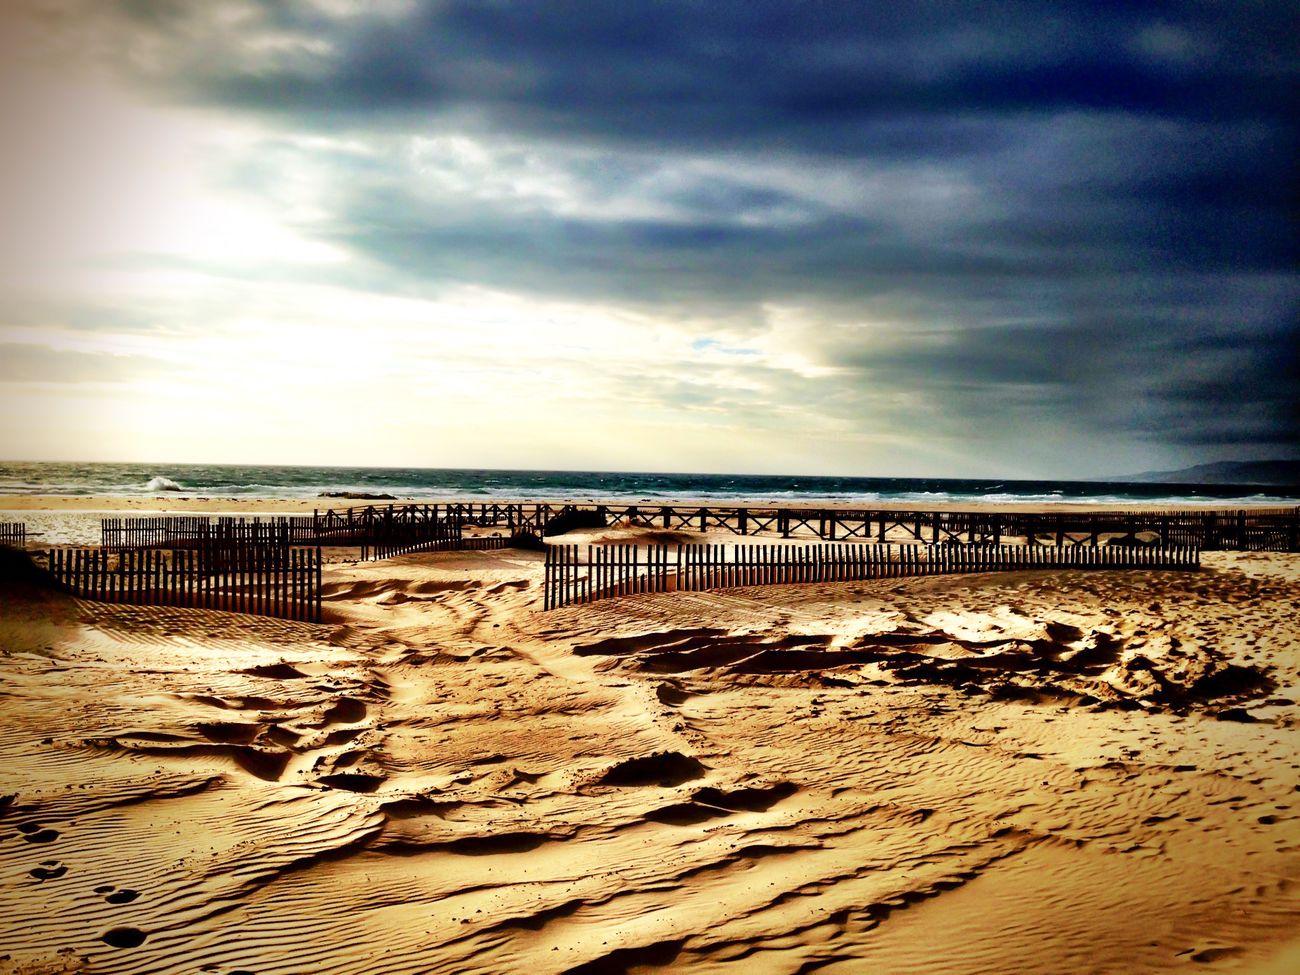 Beach Sky 7u1s